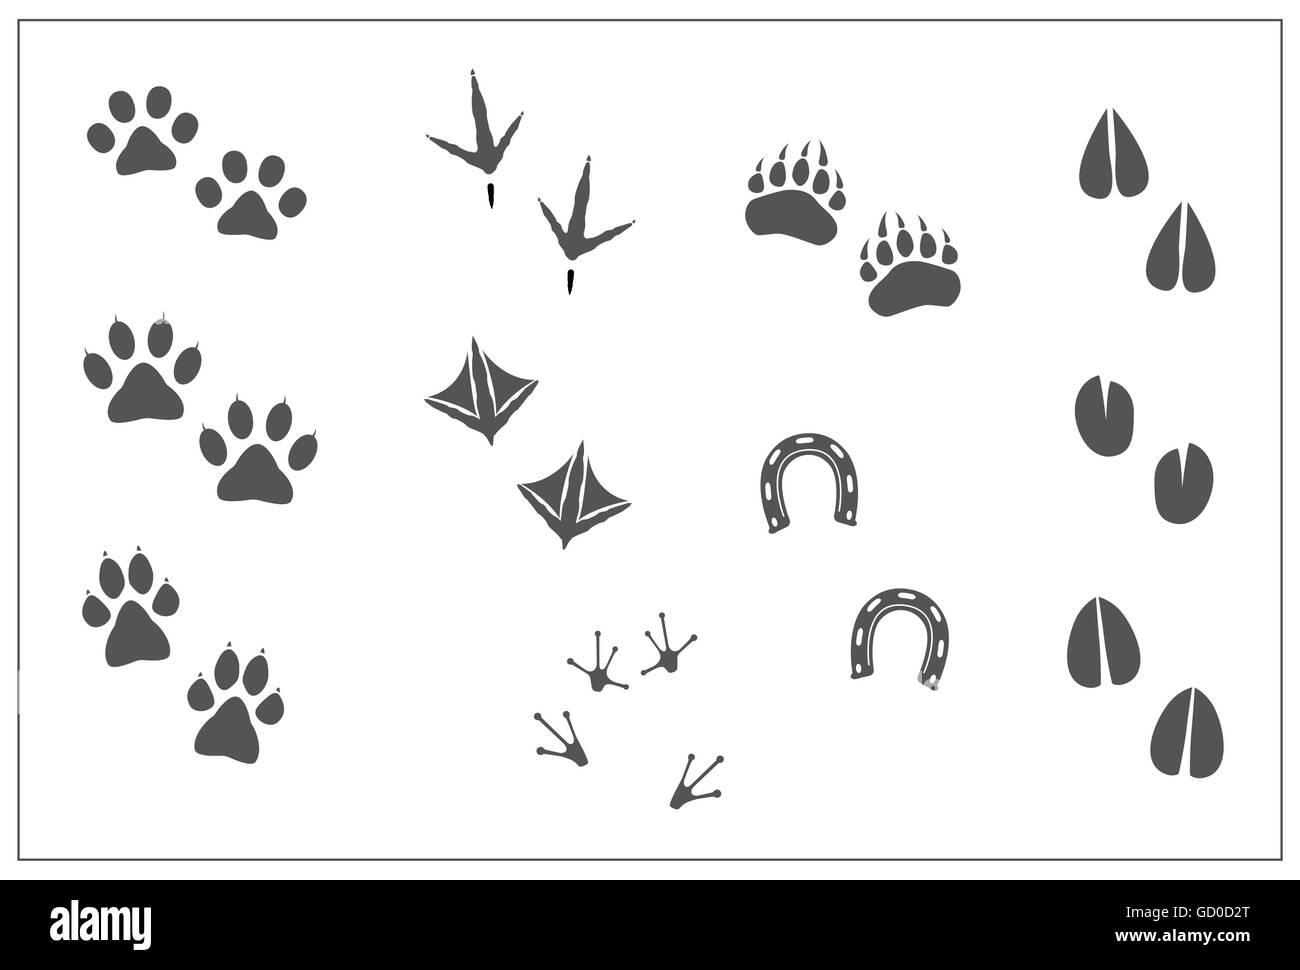 animals footprints cat paw dog paw bear paw birds chicken feet